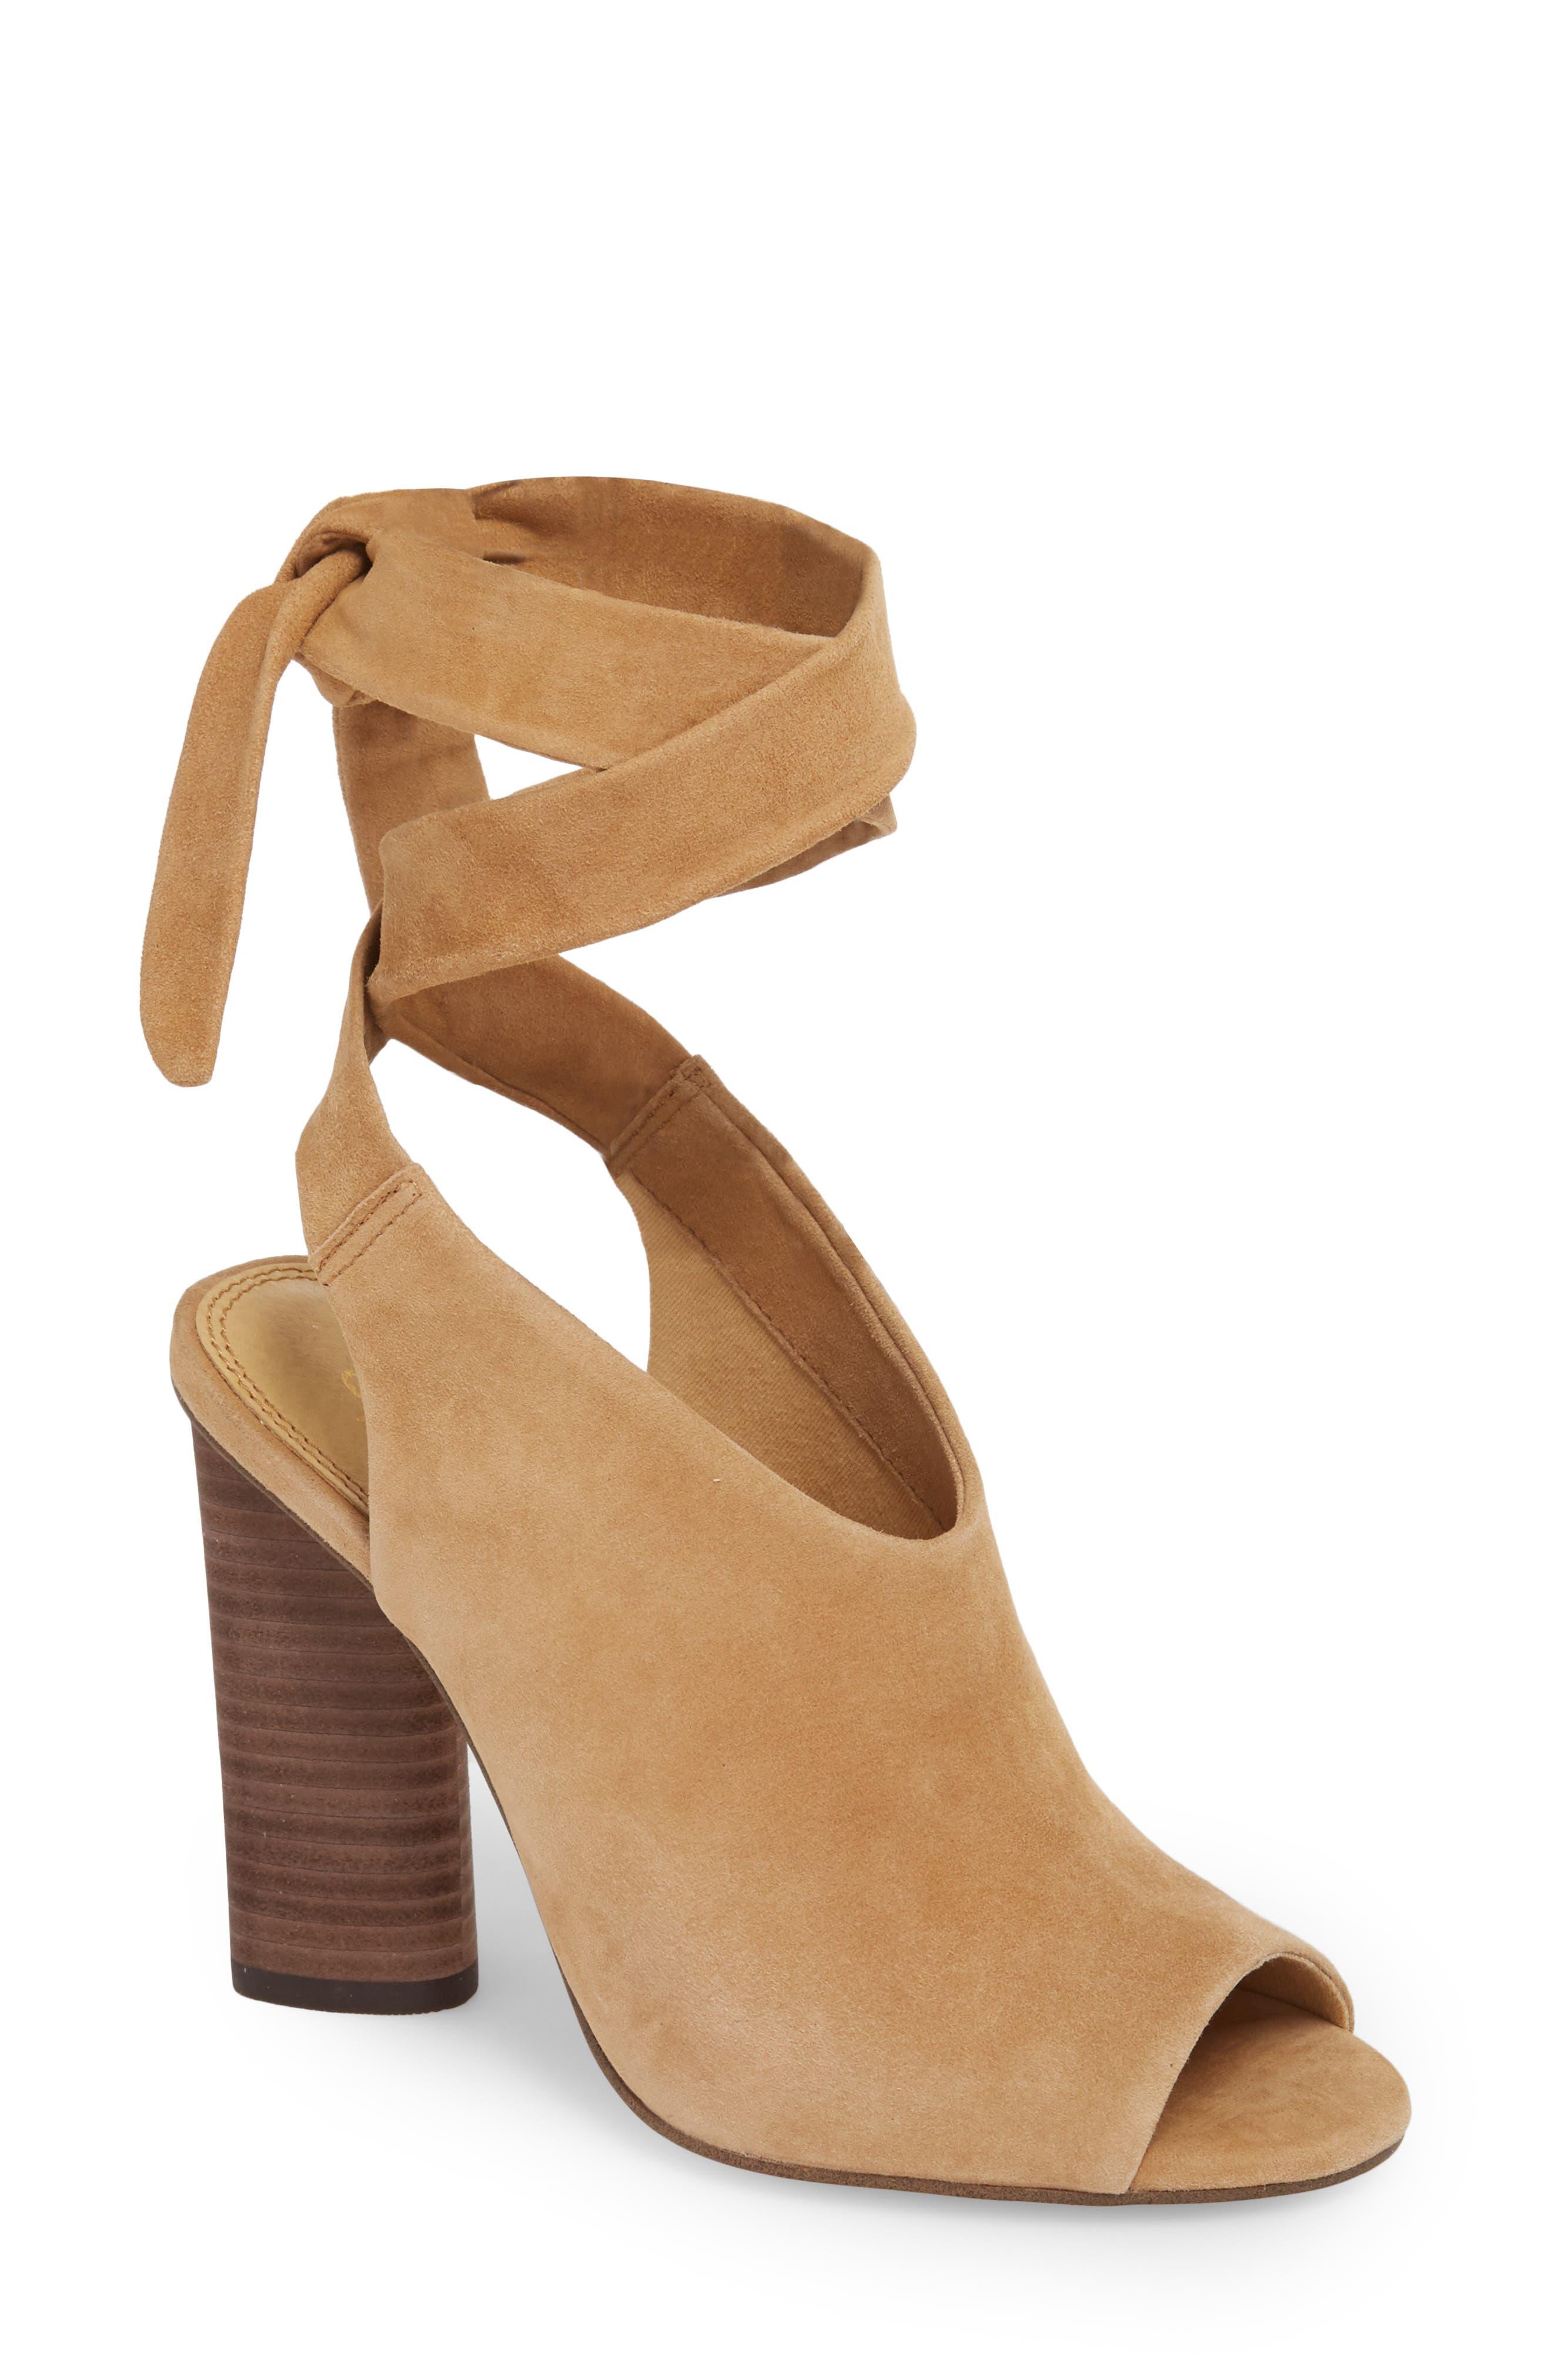 Splendid Navarro Ankle Wrap Sandal- Brown